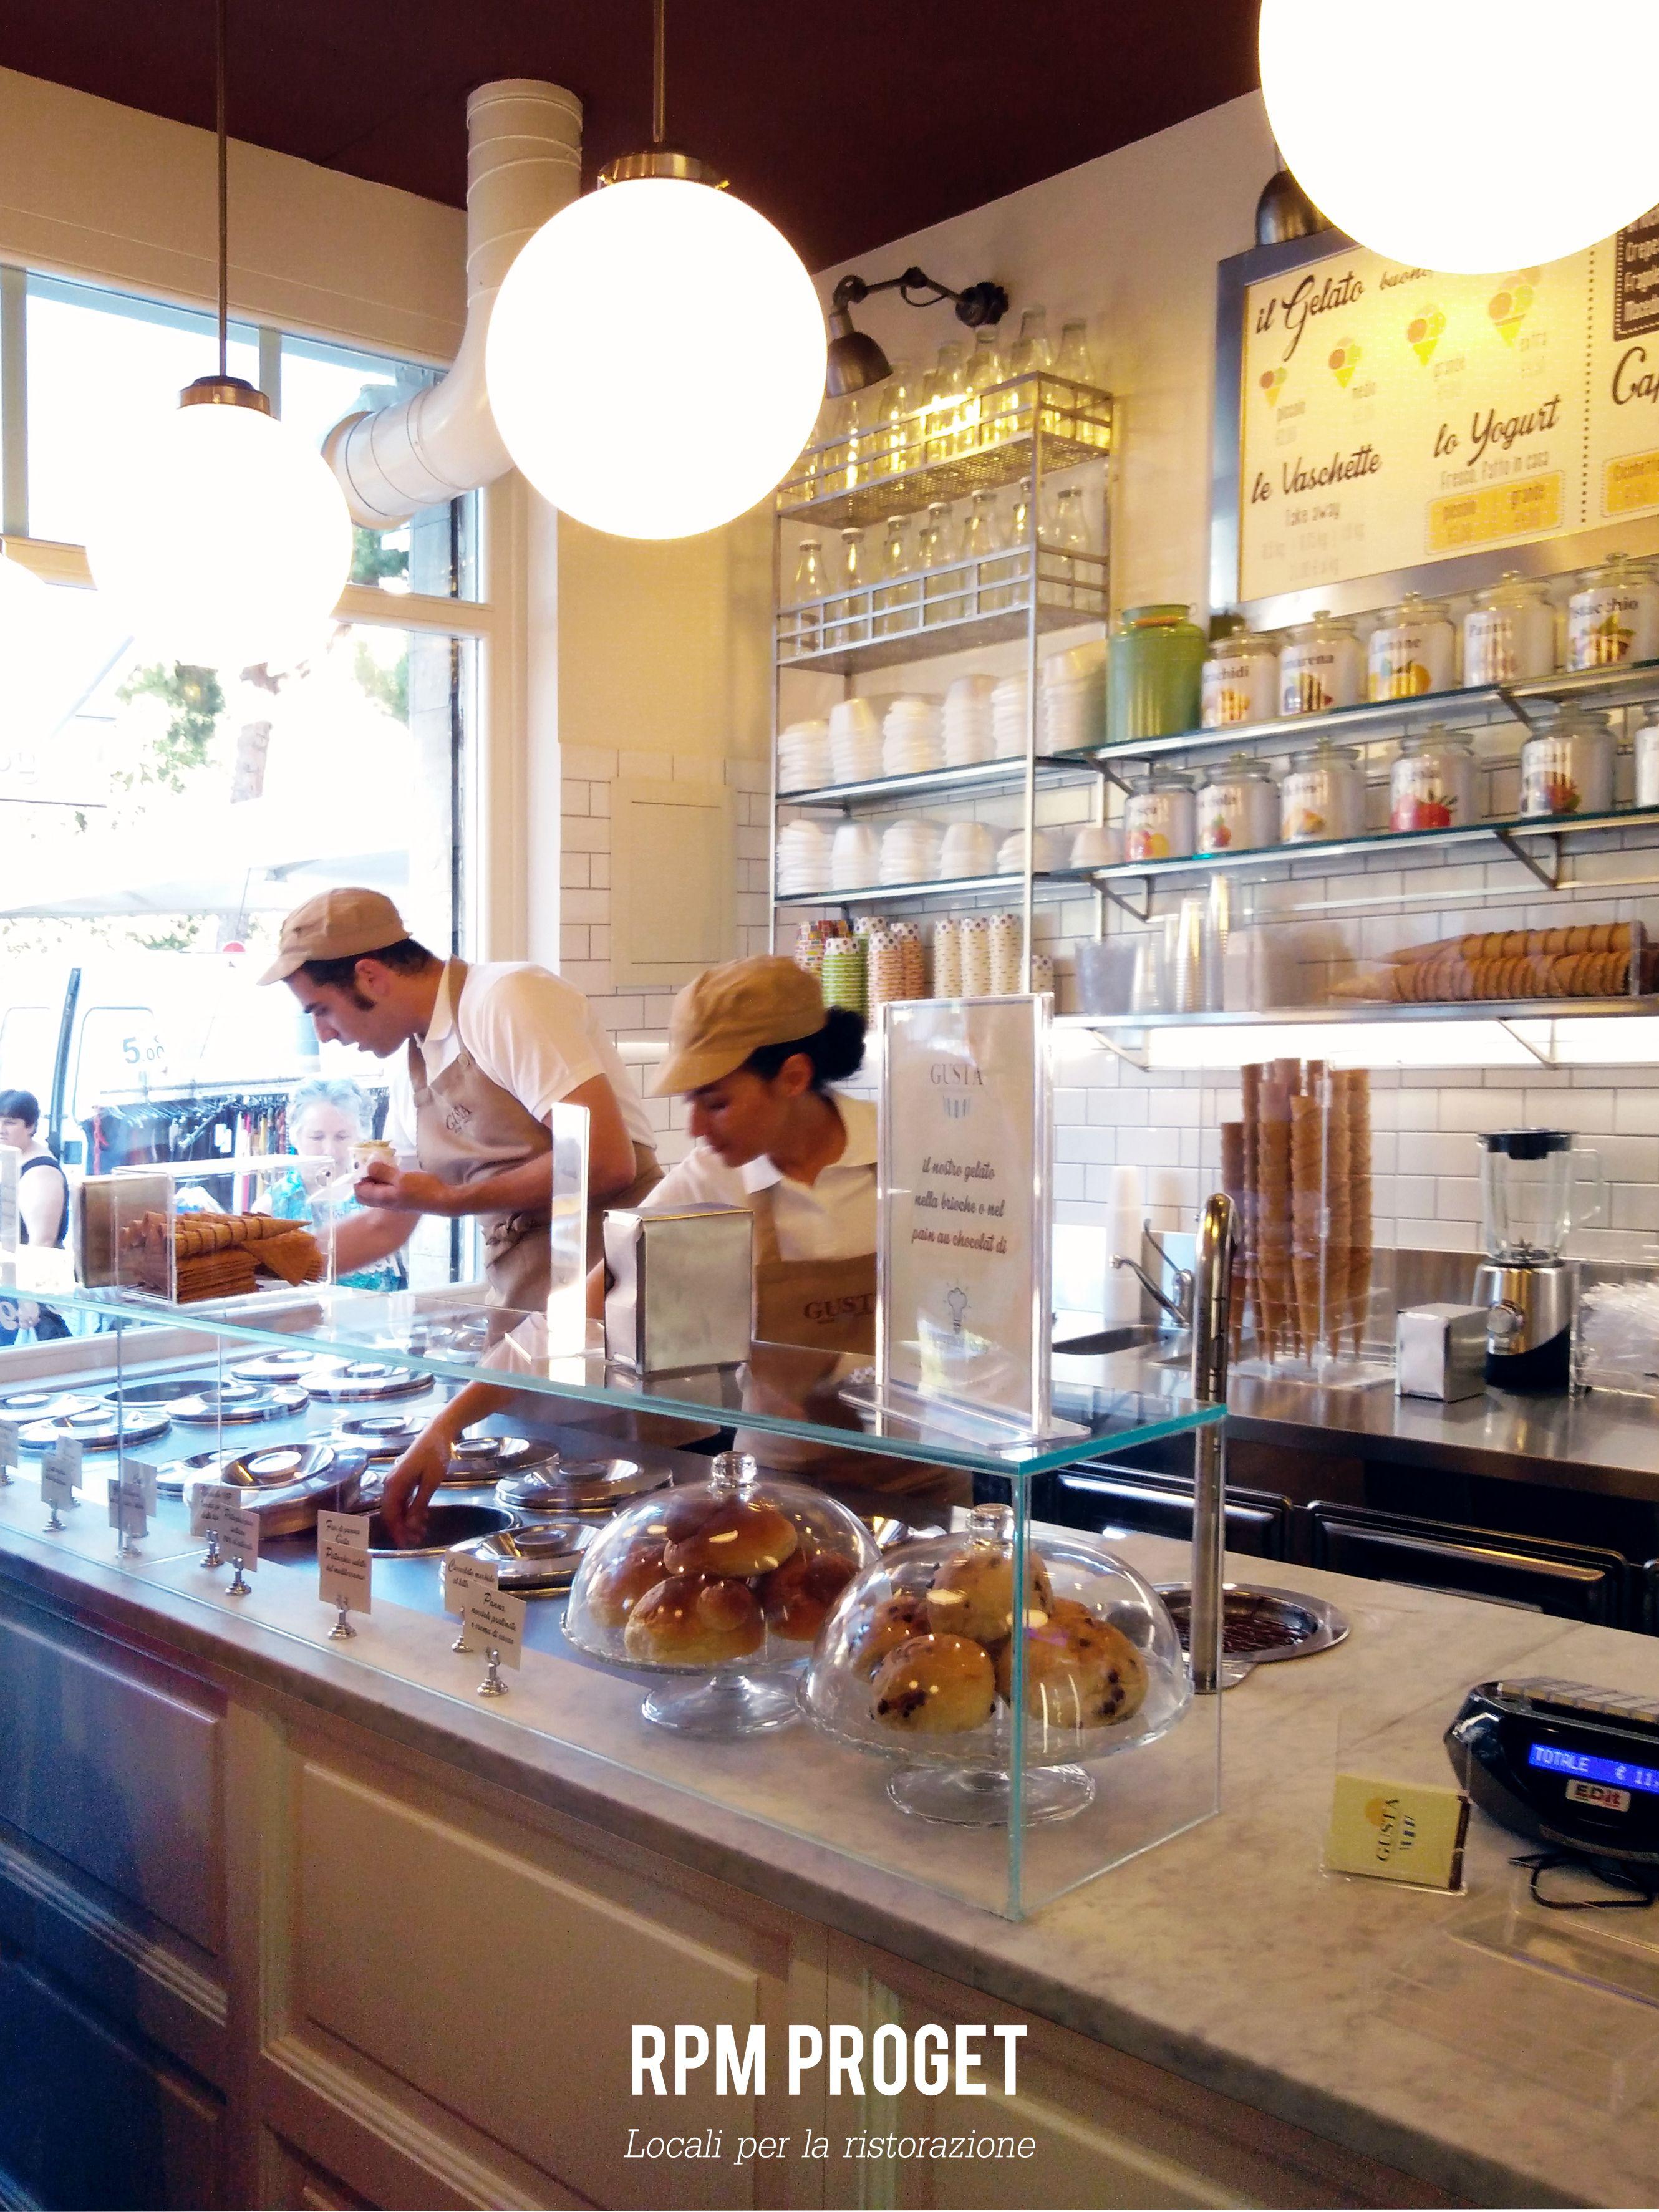 gelateria - g u s t a - buono fresco naturale piazzale enrico, Hause ideen